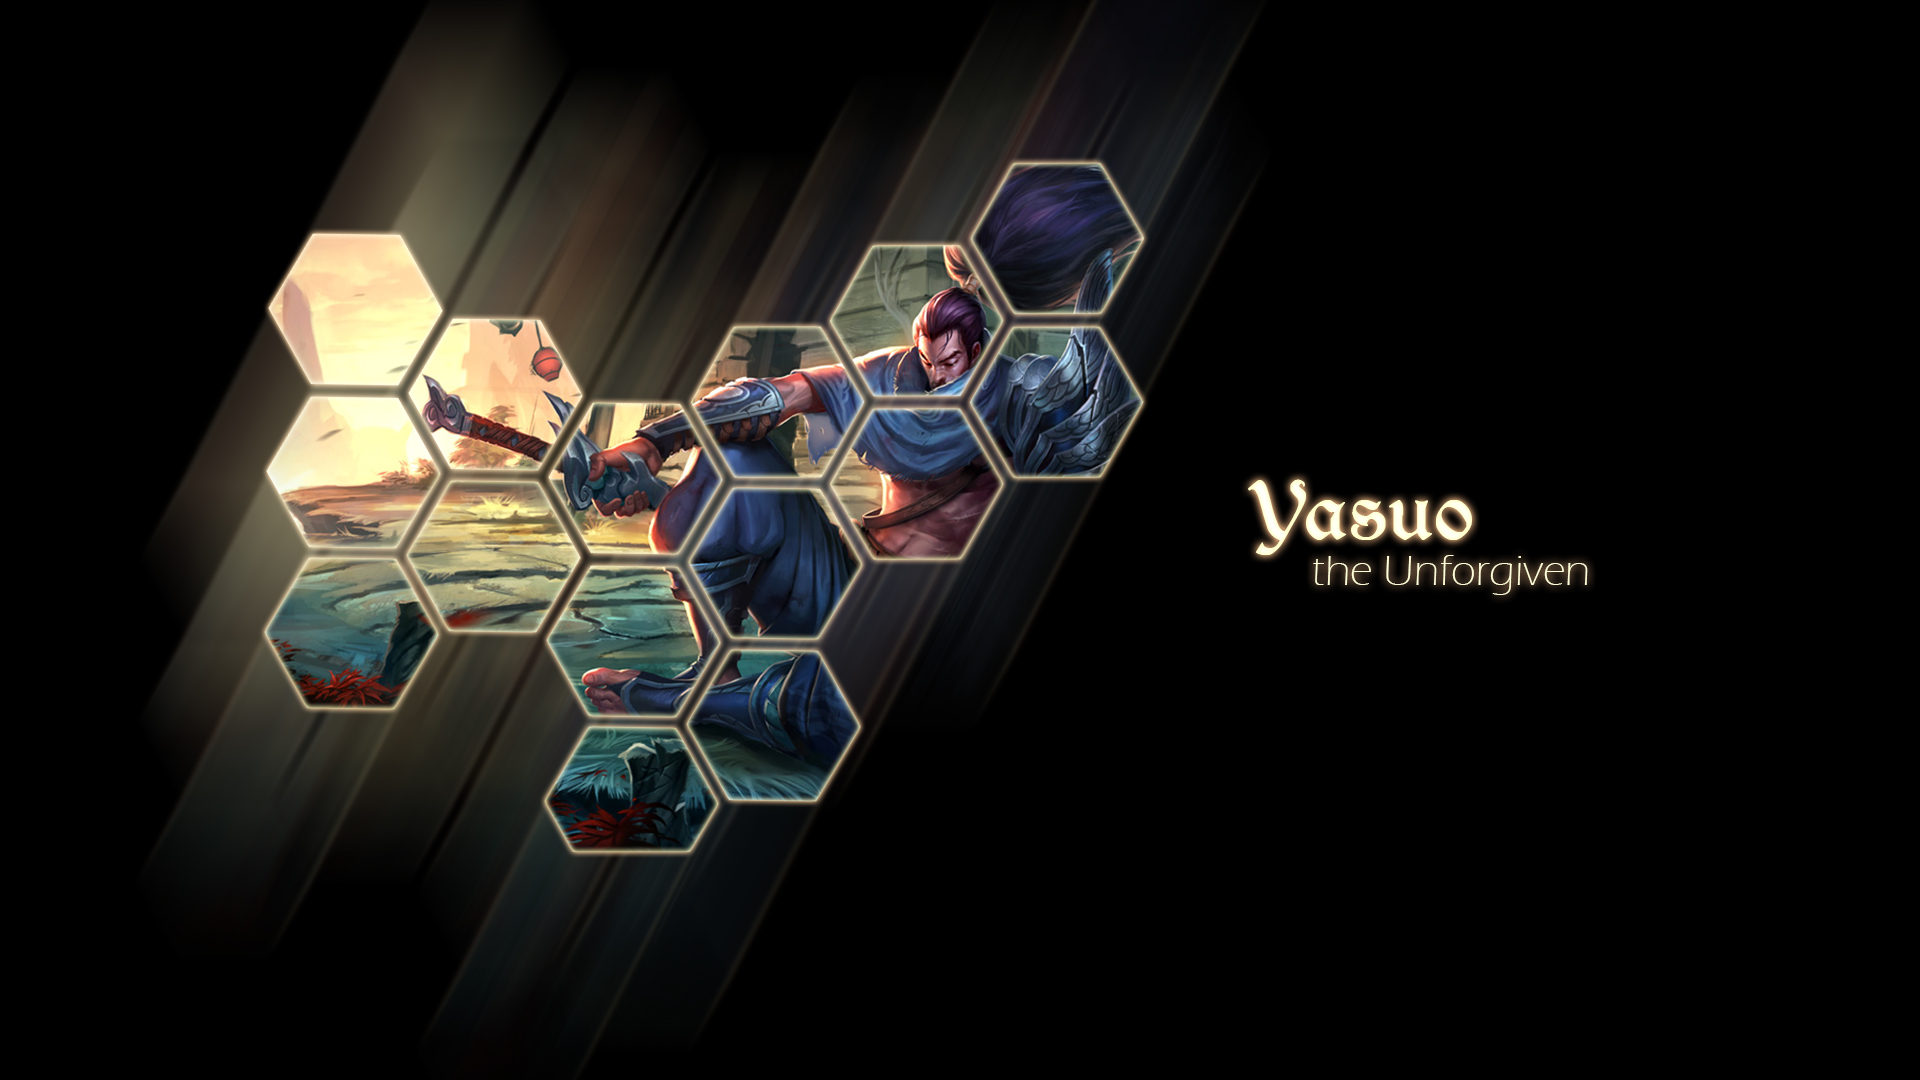 yasuo league of legends game hd wallpaper 1920x1080 1080p original ...